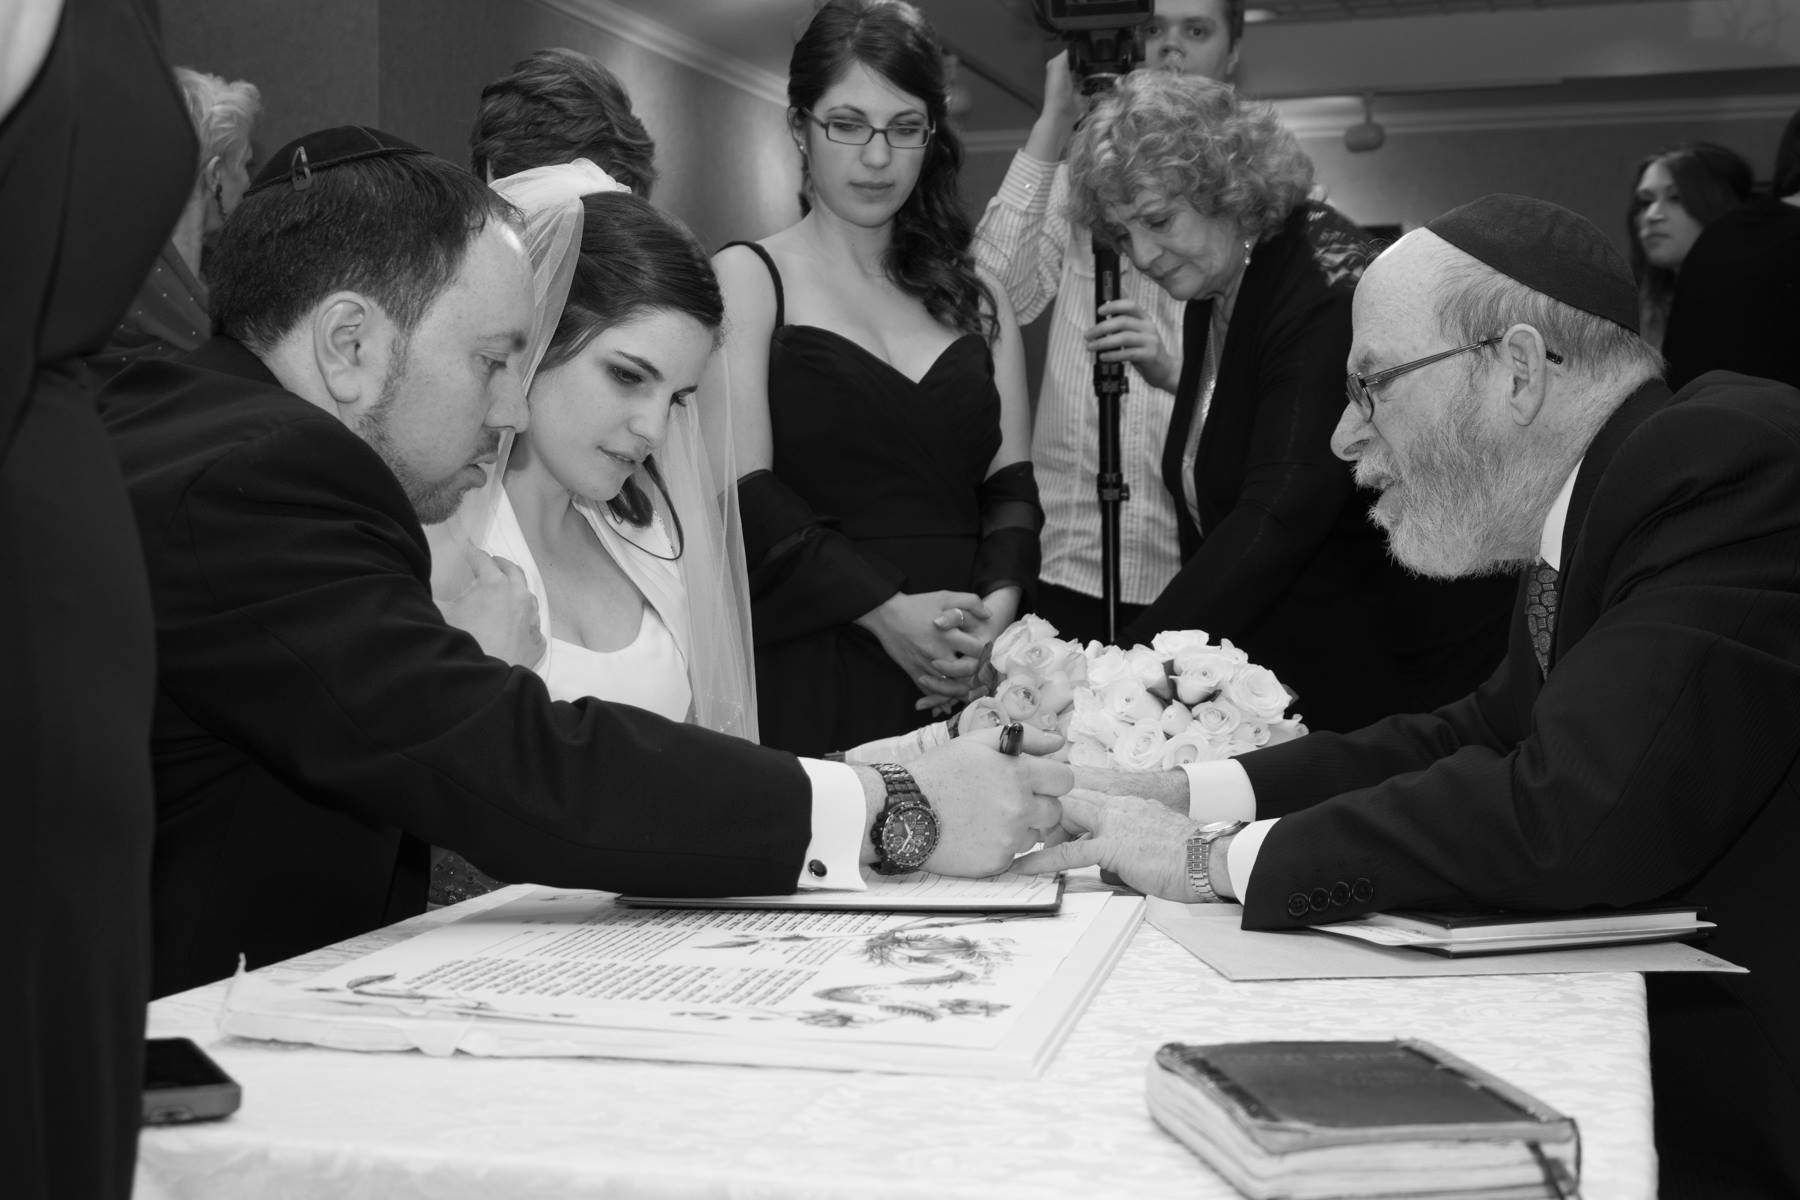 Toronto Jewish wedding at Peter and Paul the manor